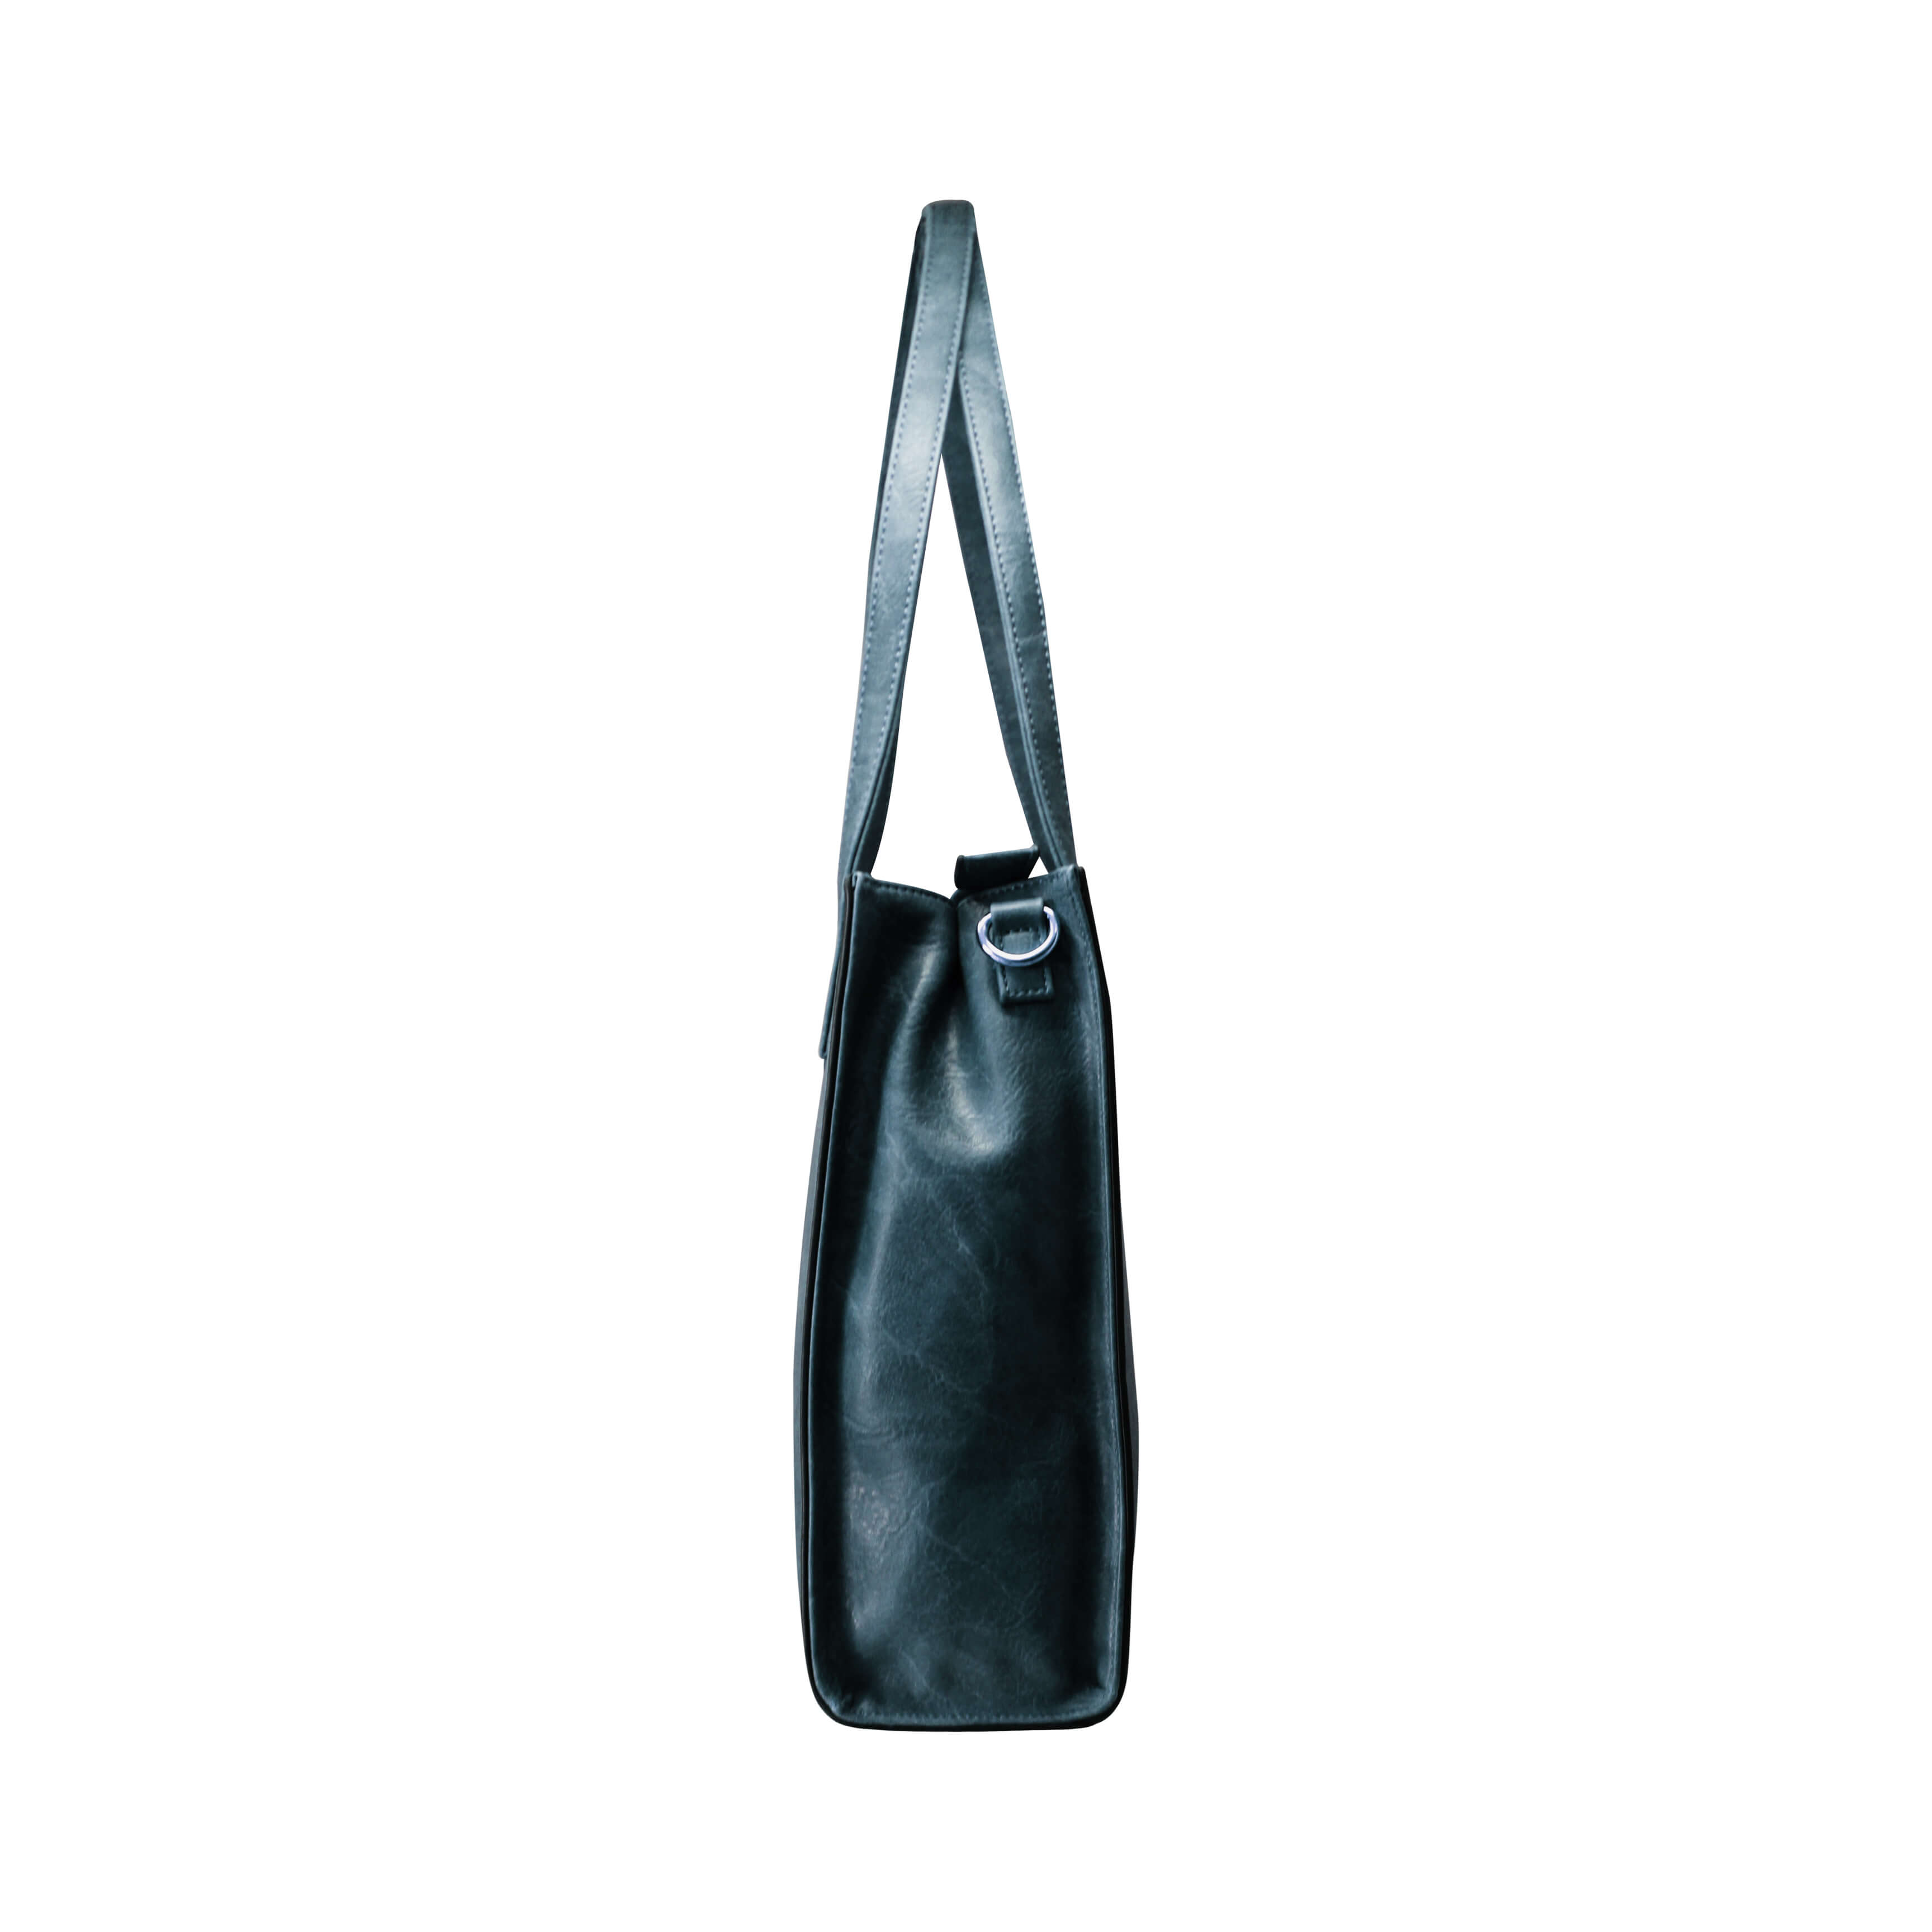 RECTANGULAR BOARDED BAG (RB)-BLUE 7